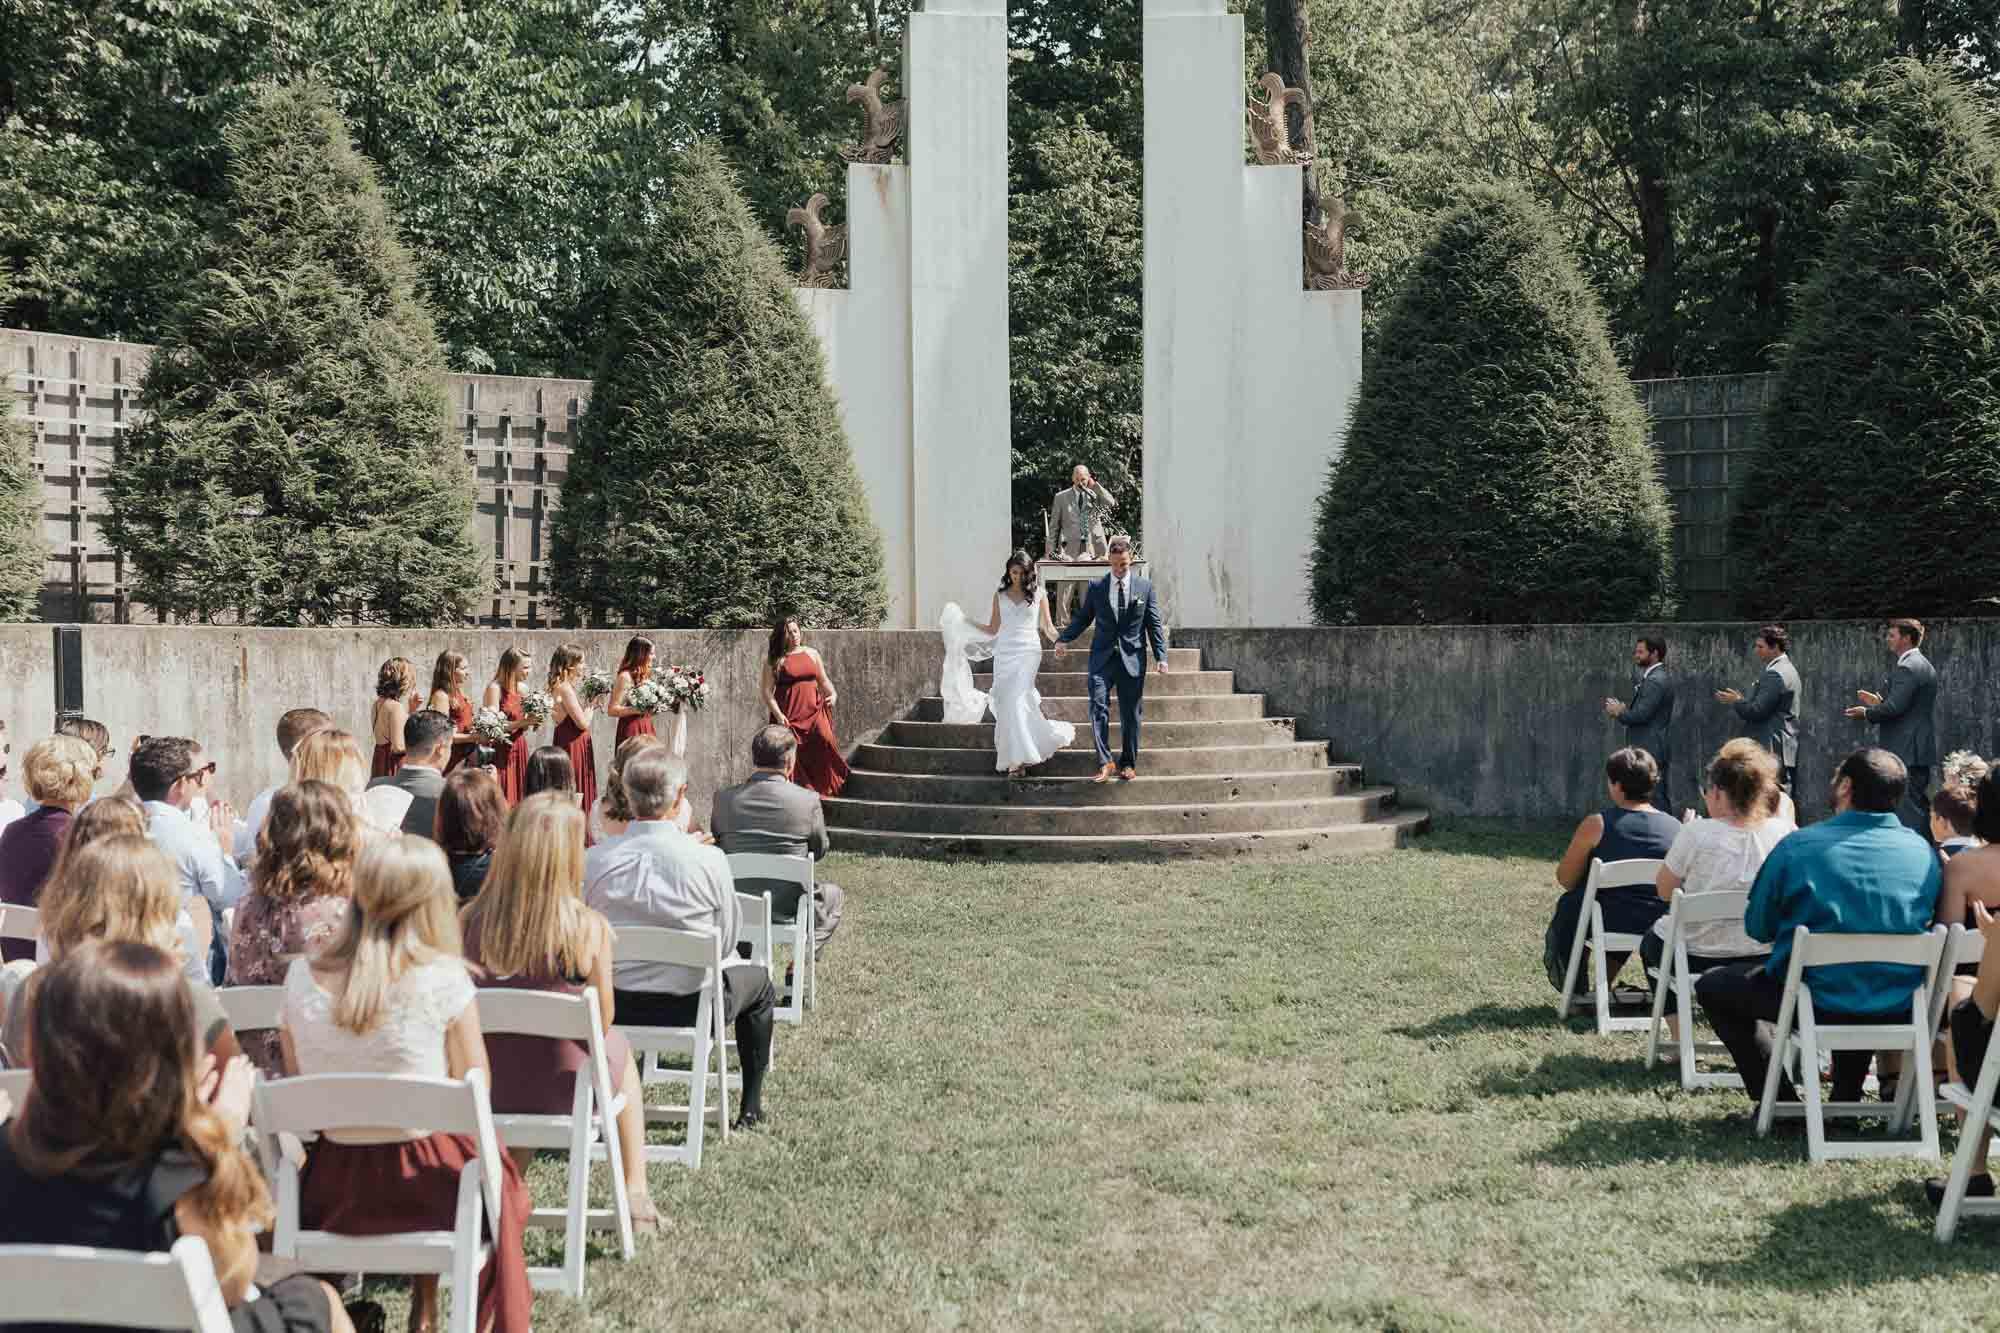 champaign_il_wedding_photography-0339.jpg